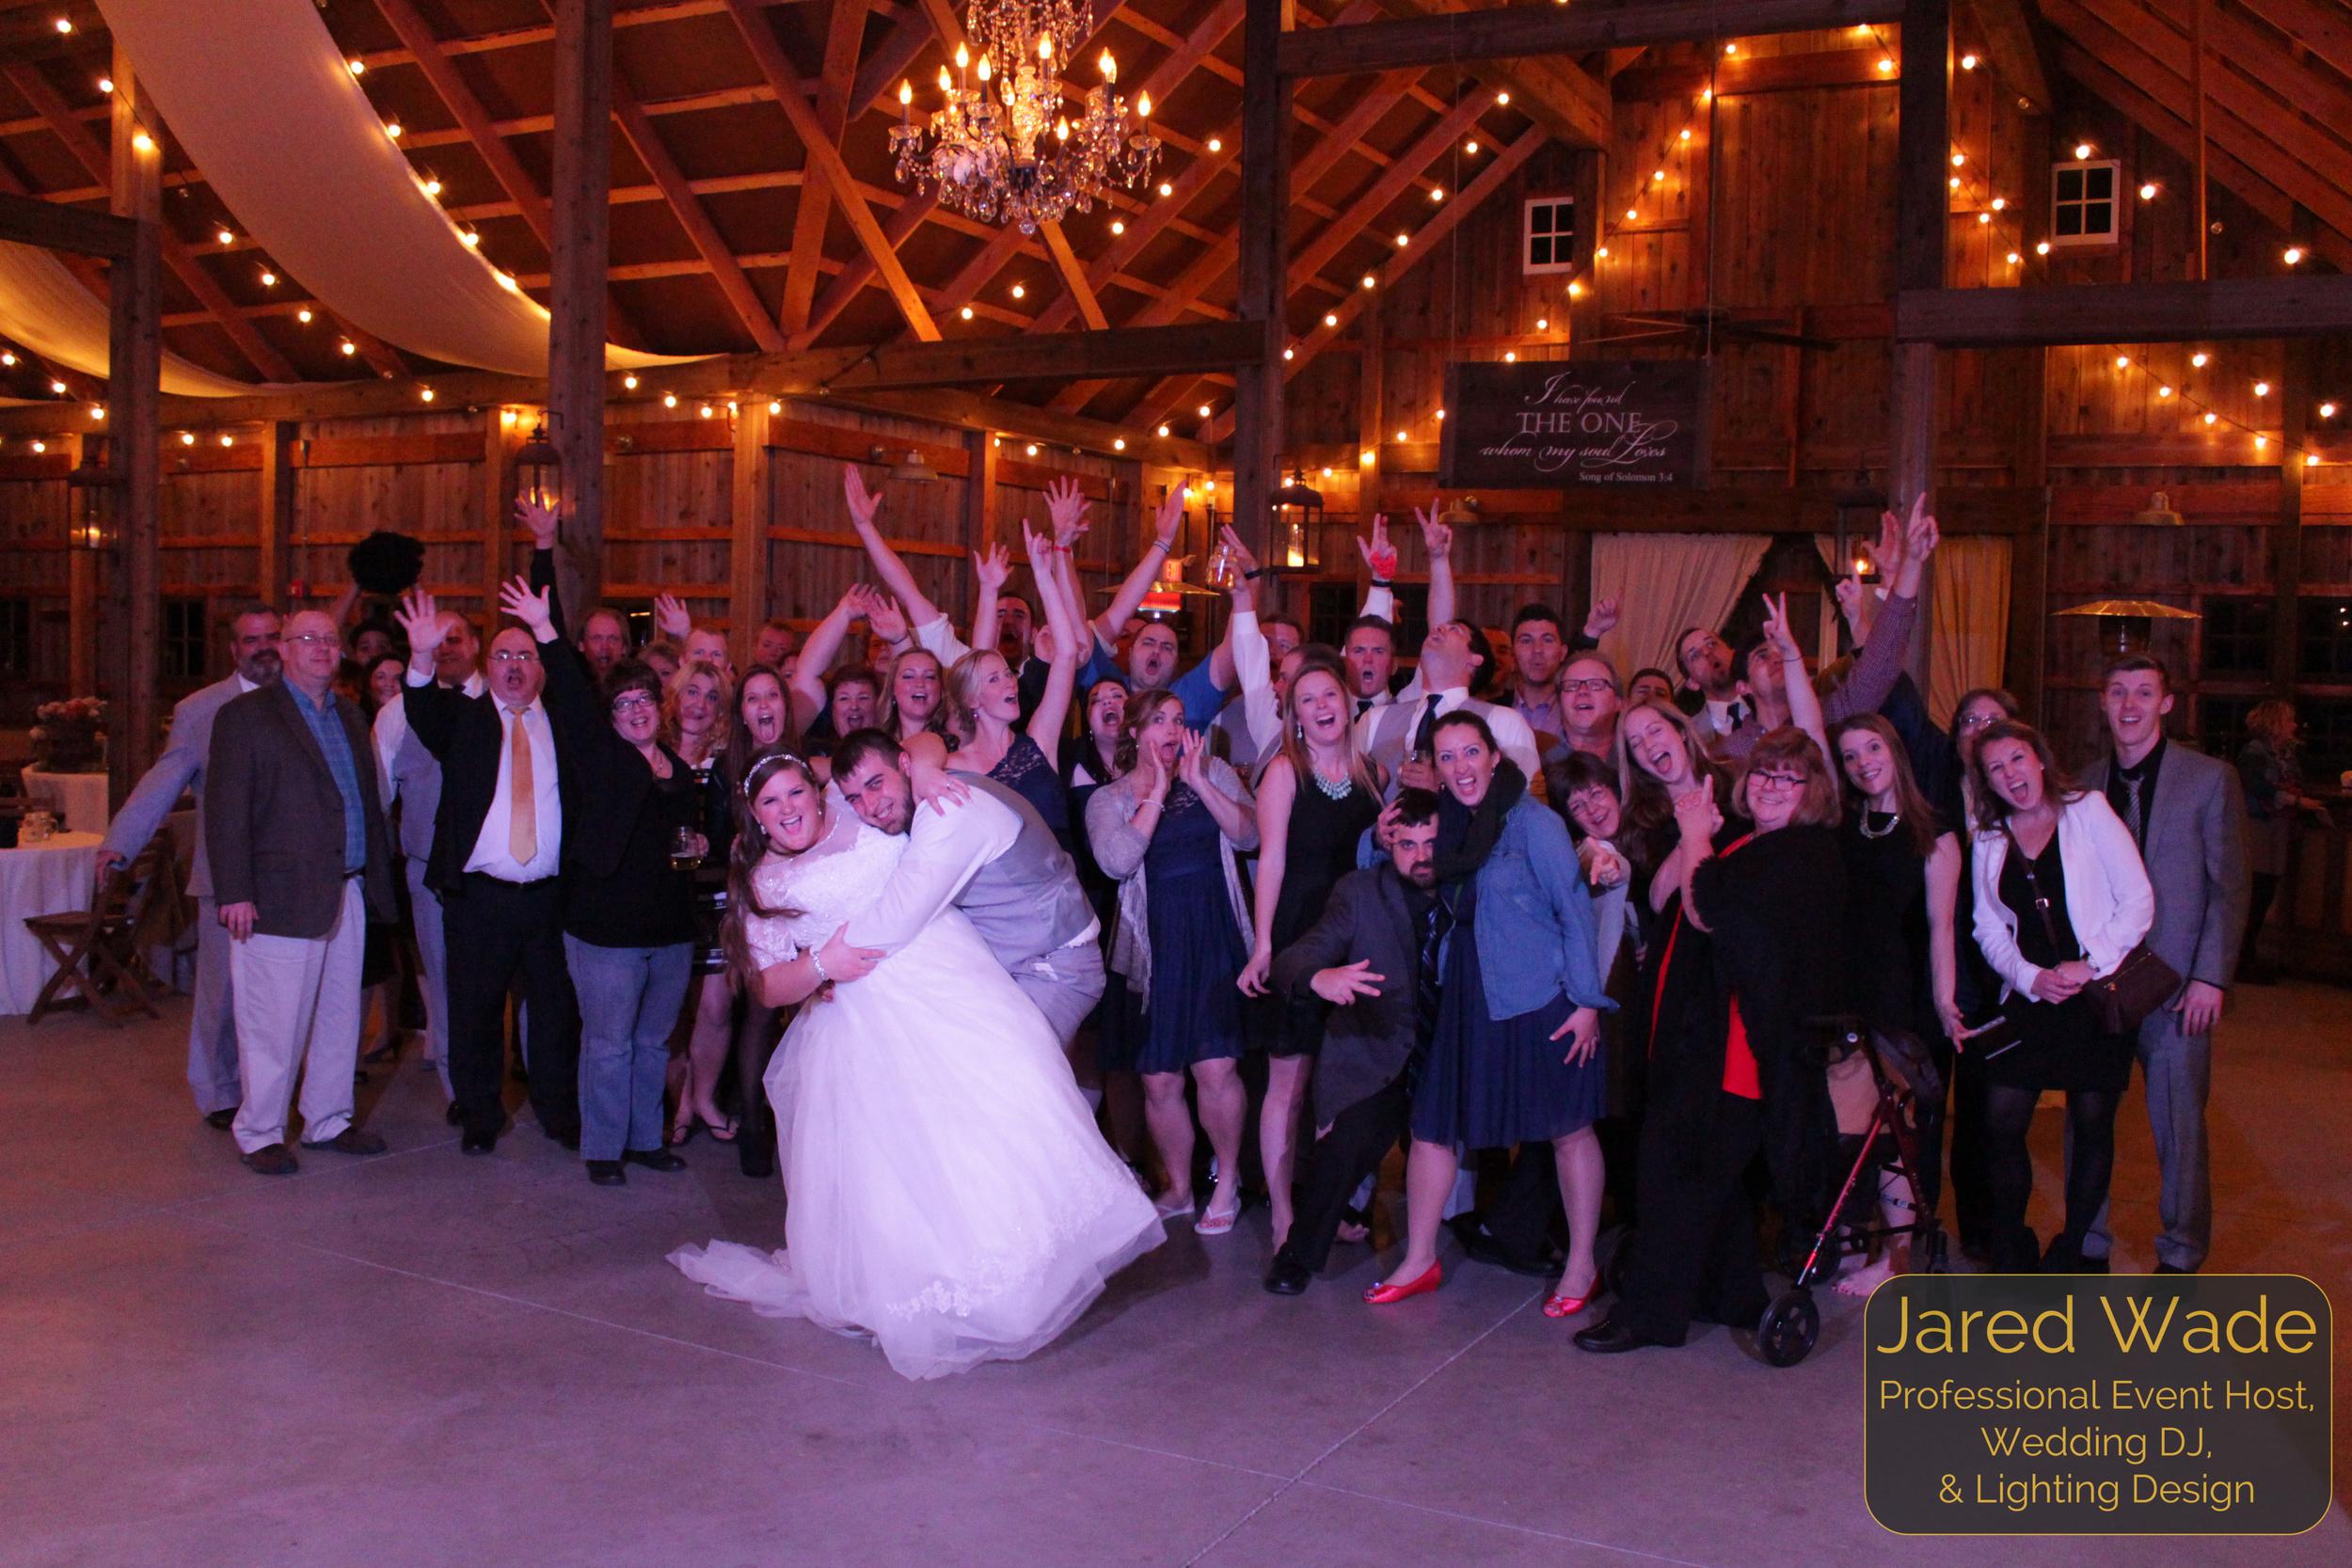 Kati & Cody Deckard Crazy Shot #ProfessionalEventHost #EndOfNightShot Indianapolis Wedding DJ and Professional Event Host Jared Wade